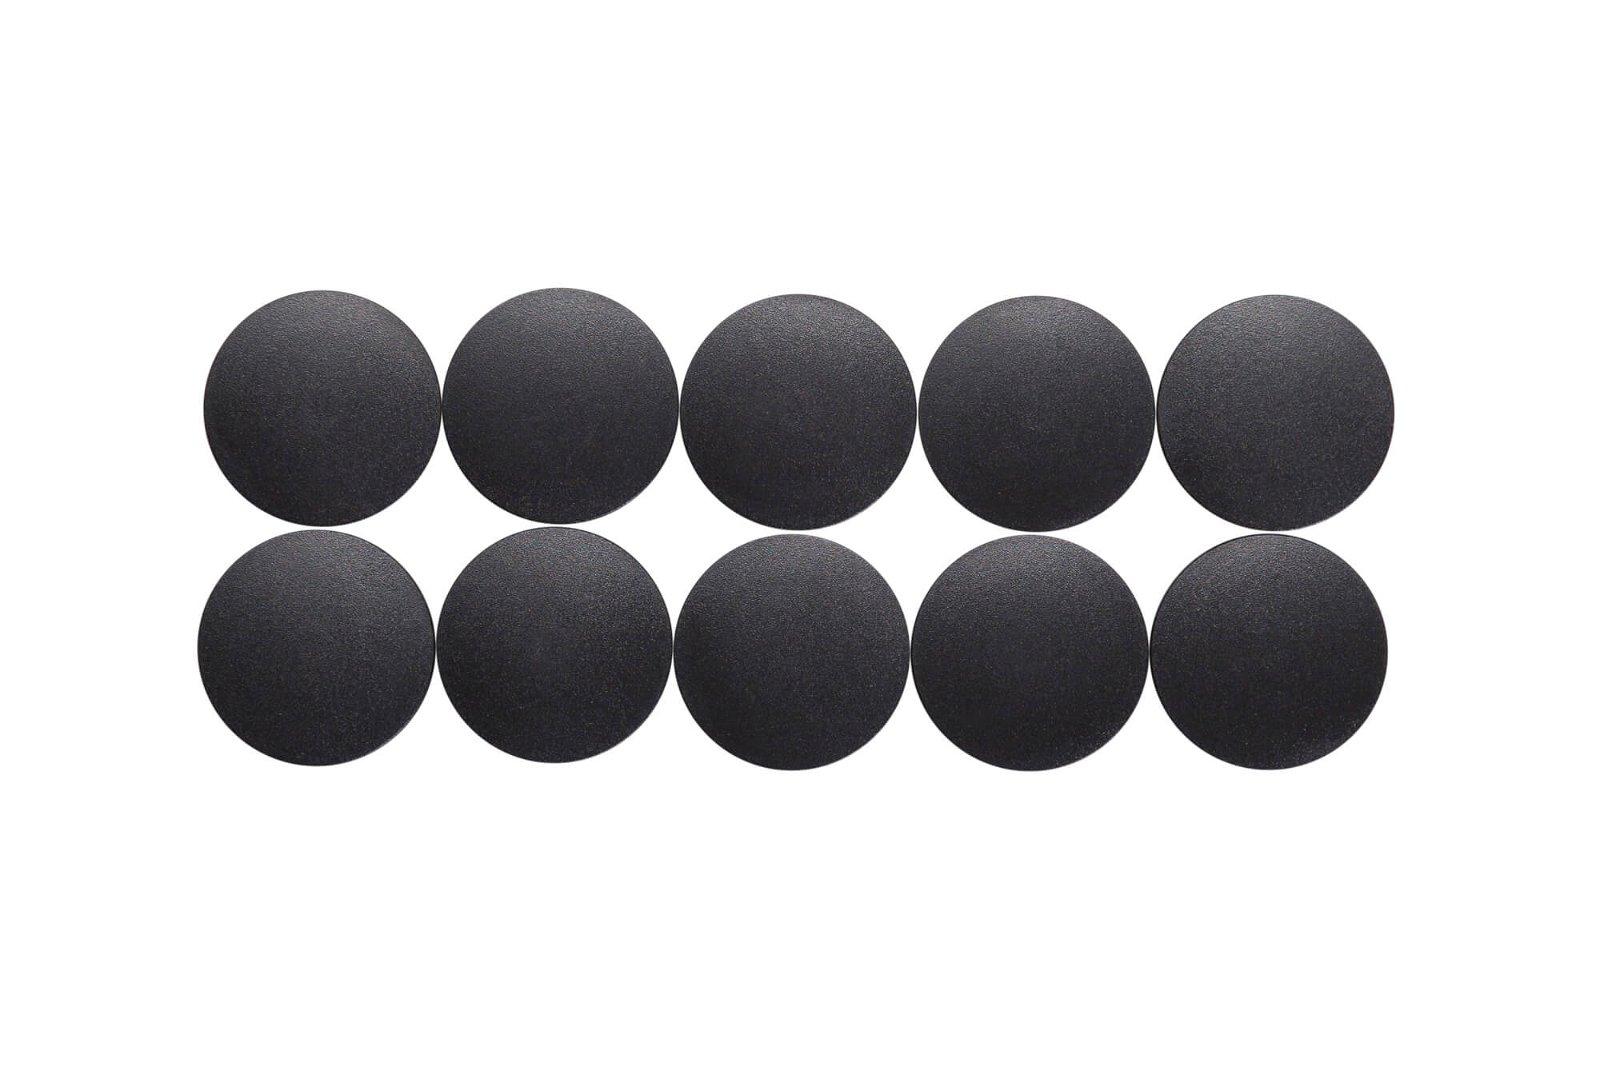 Magnet MAULsolid Ø 32 mm, 0,8 kg Haftkraft, 10 St./Ktn., schwarz